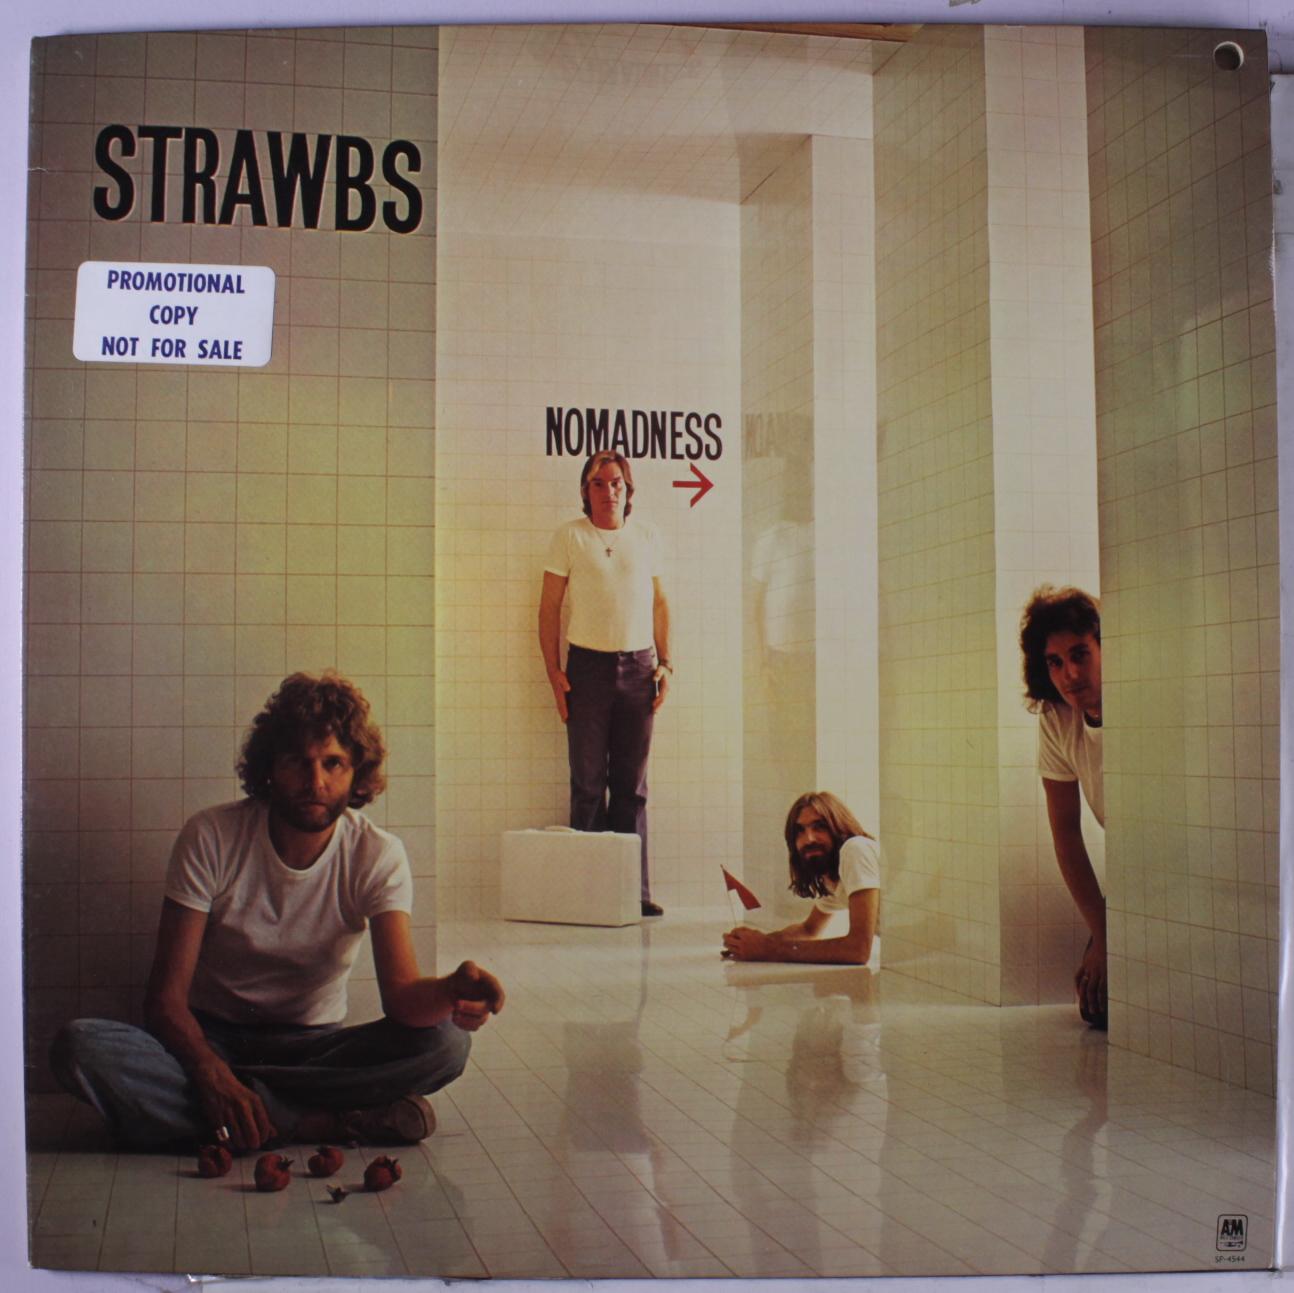 Strawbs Nomadnesss